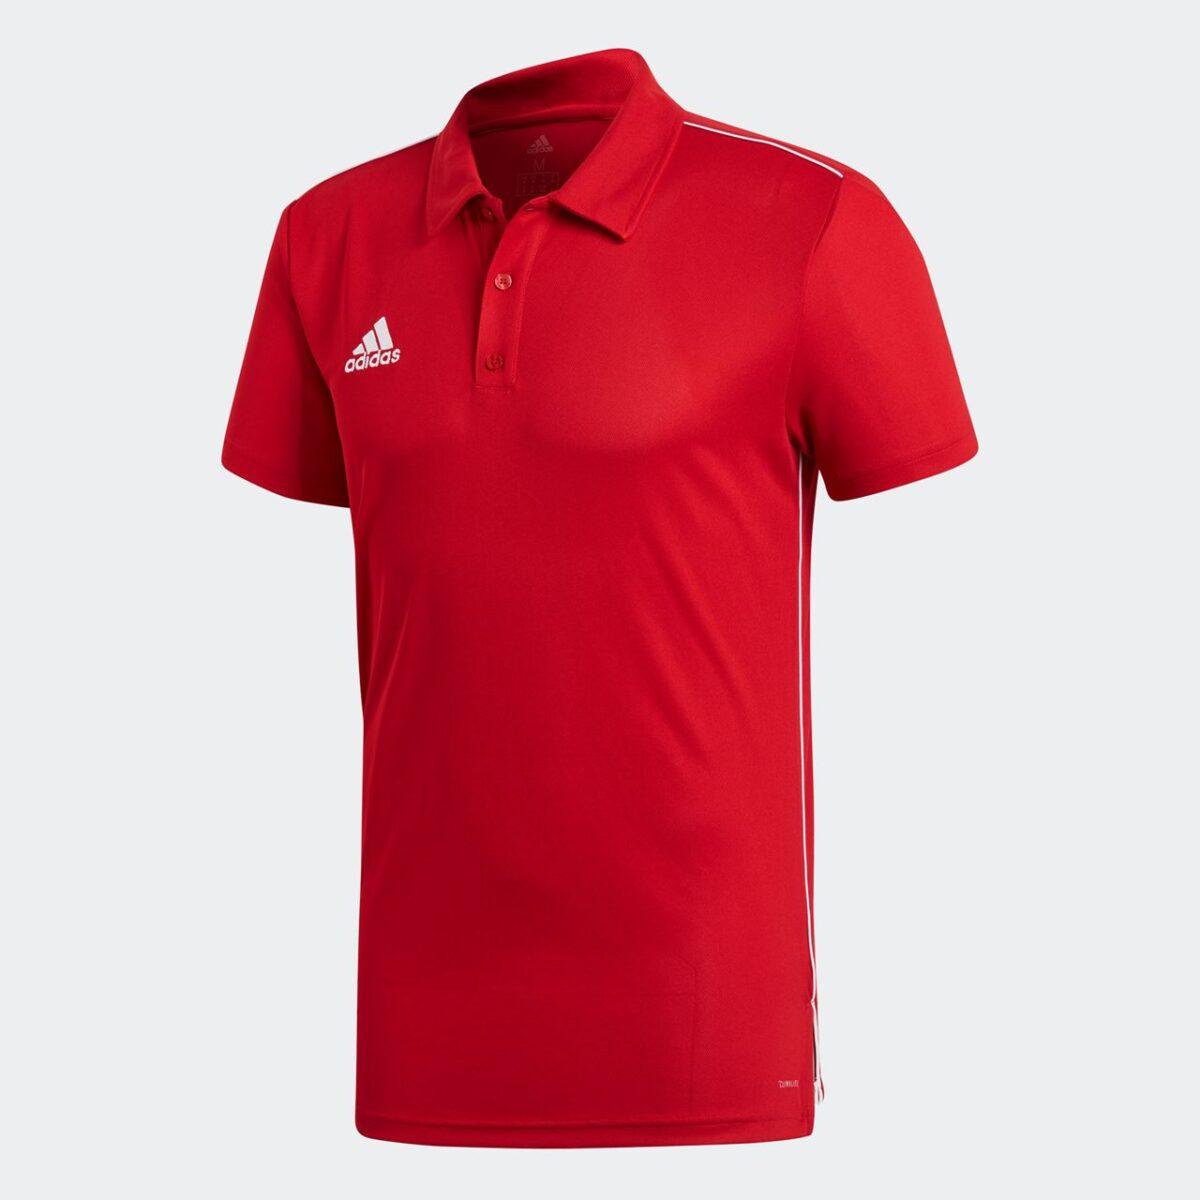 Adidas Core 18 Polo Shirt Adult